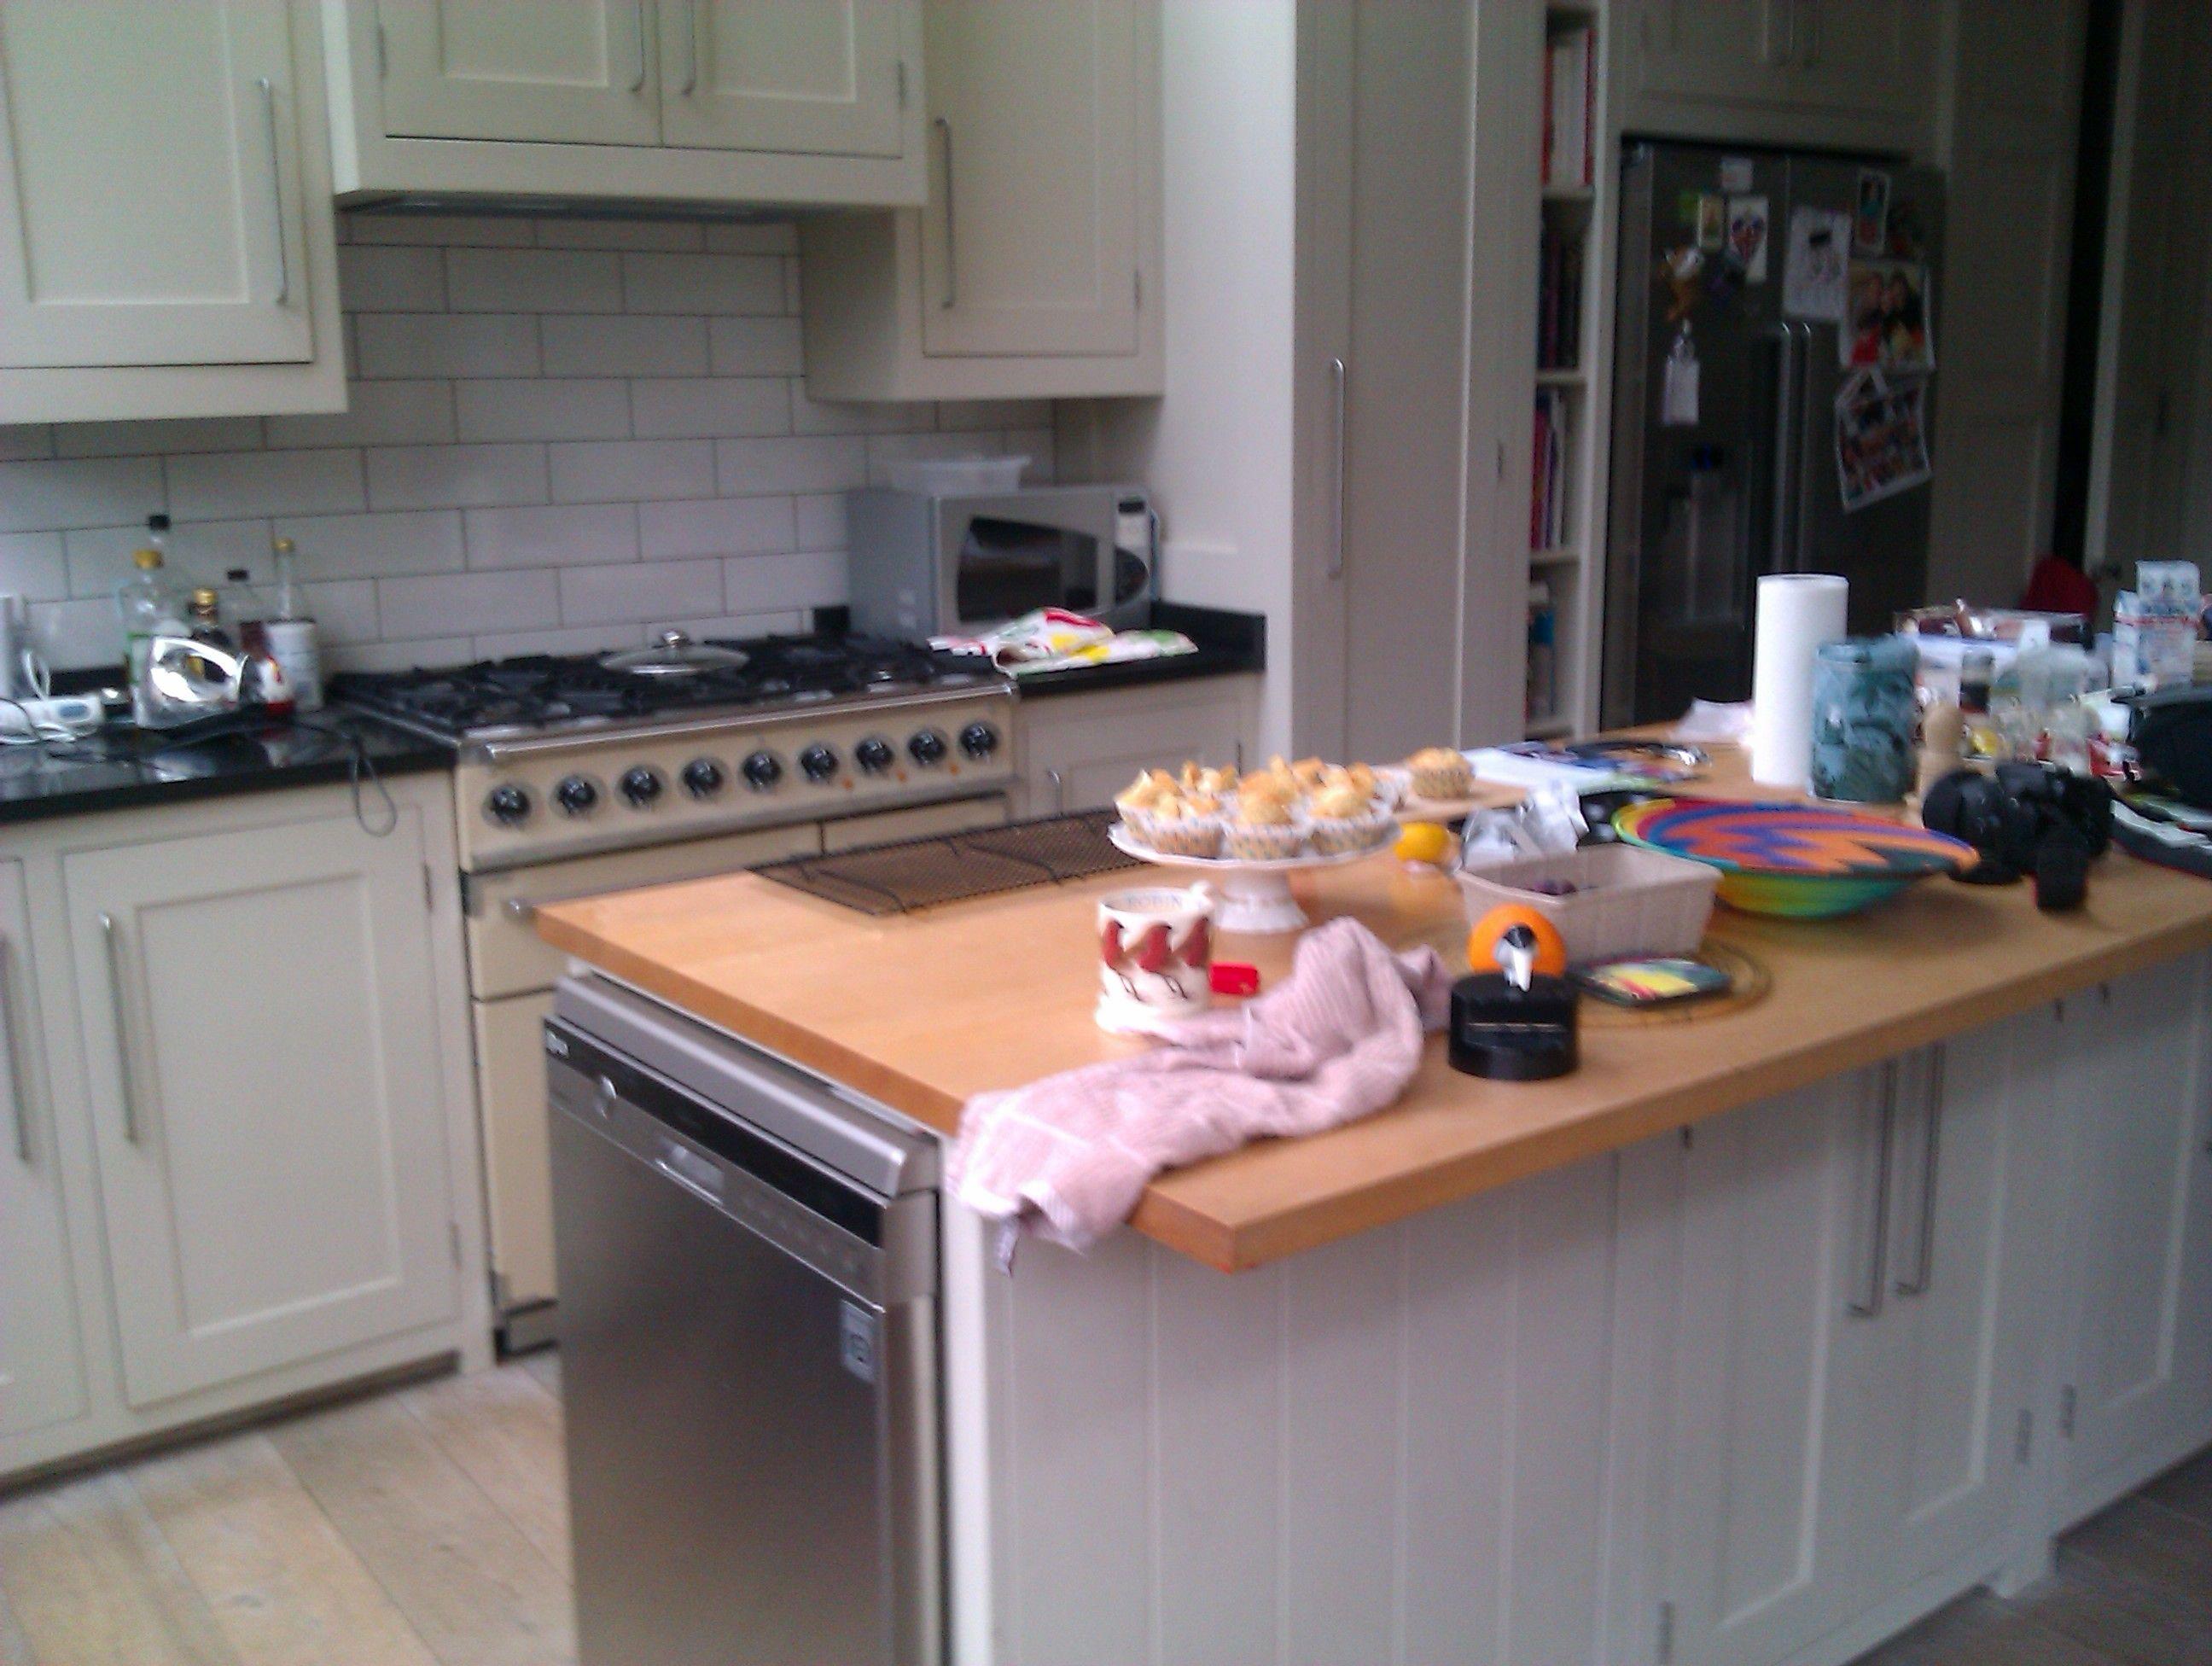 gemma s kitchen overhang on island dishwasher in the end gemma s kitchen overhang on island